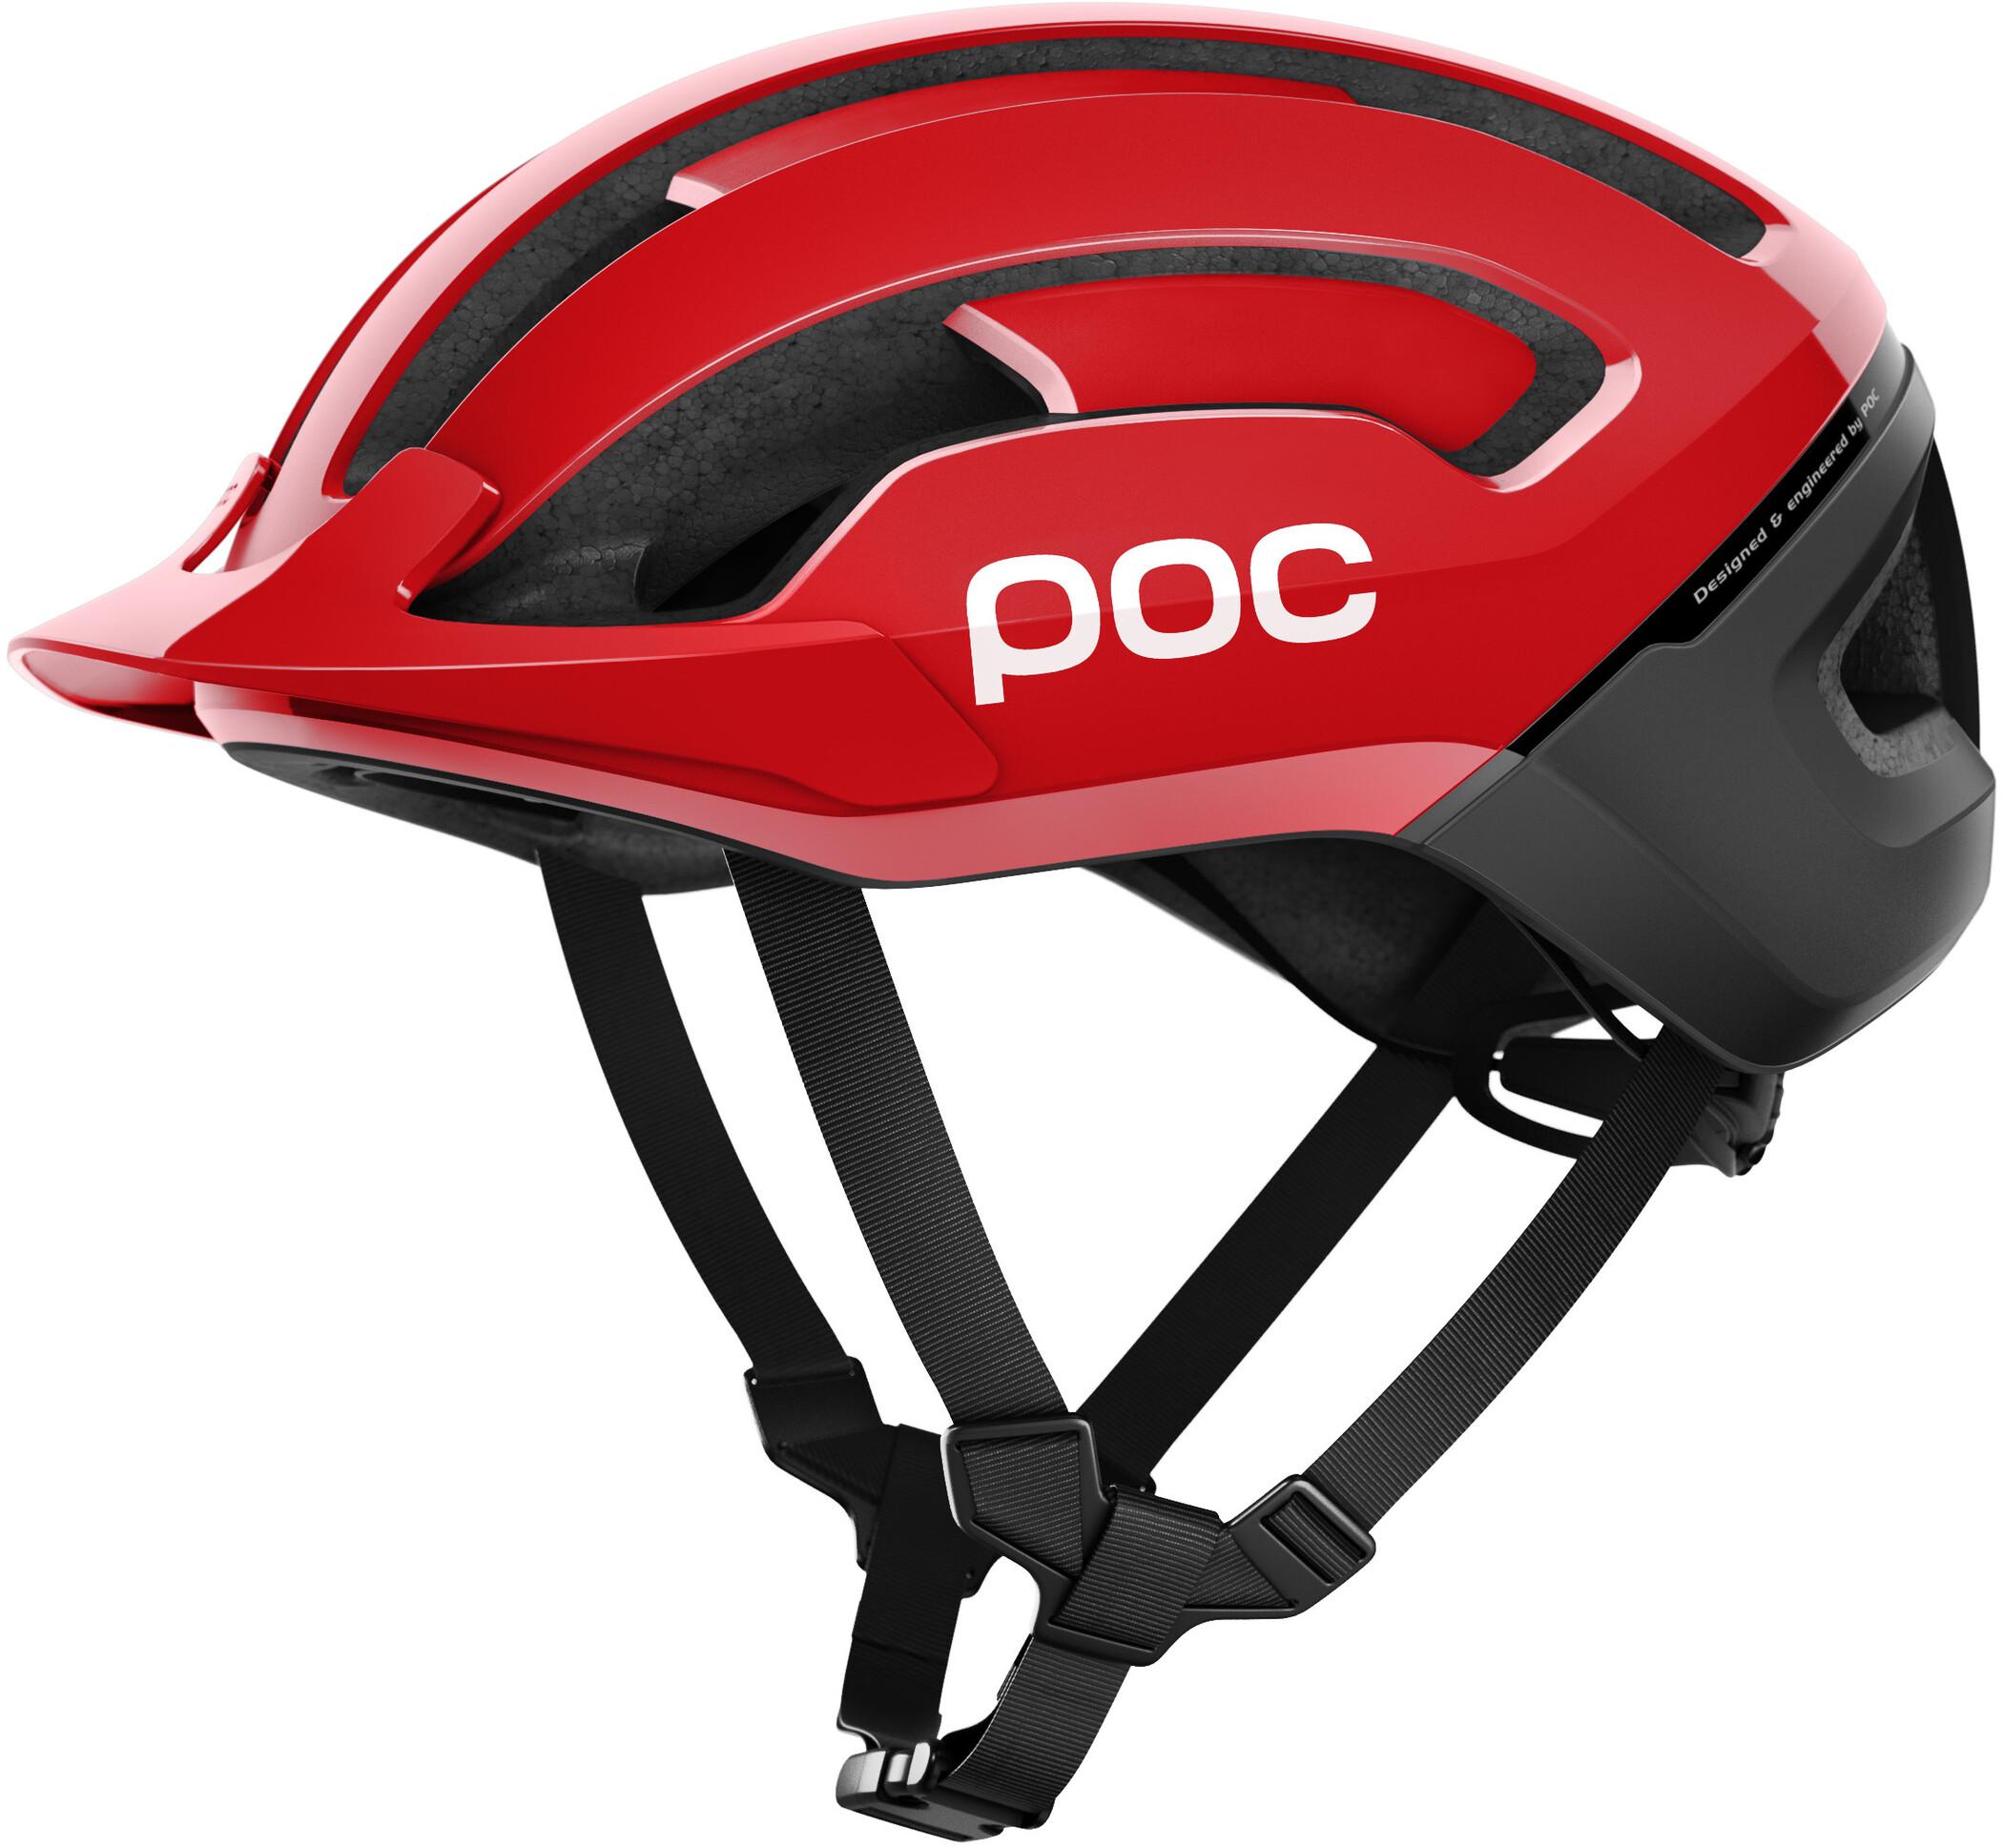 POC Omne Air Resistance Spin Cykelhjelm, prismane red (2019) | Helmets